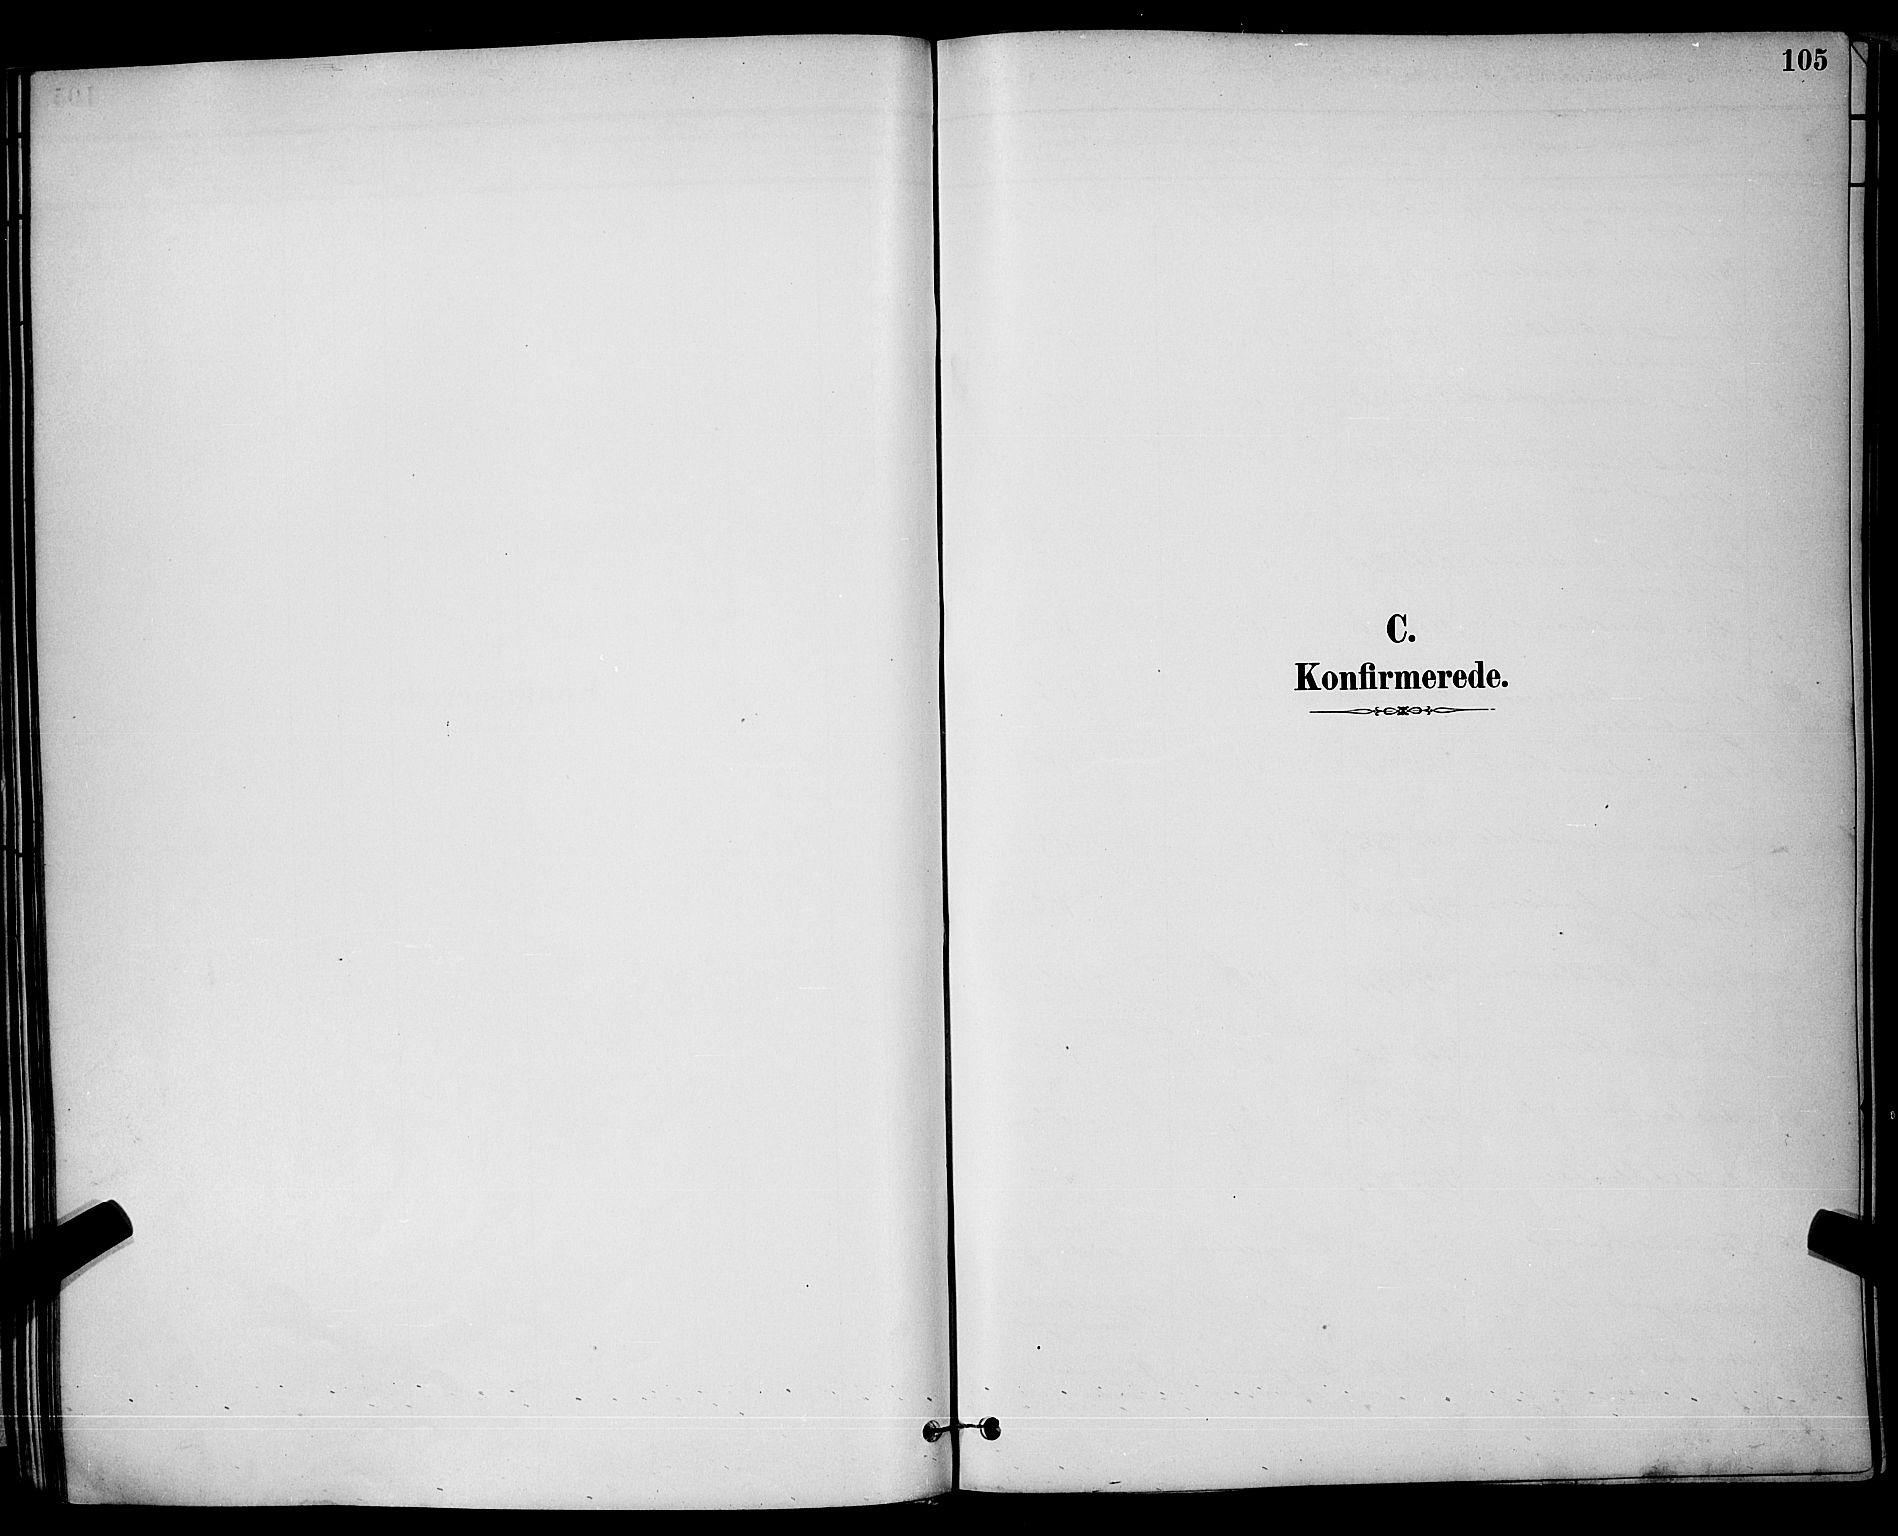 SAKO, Brevik kirkebøker, G/Ga/L0004: Klokkerbok nr. 4, 1882-1900, s. 105